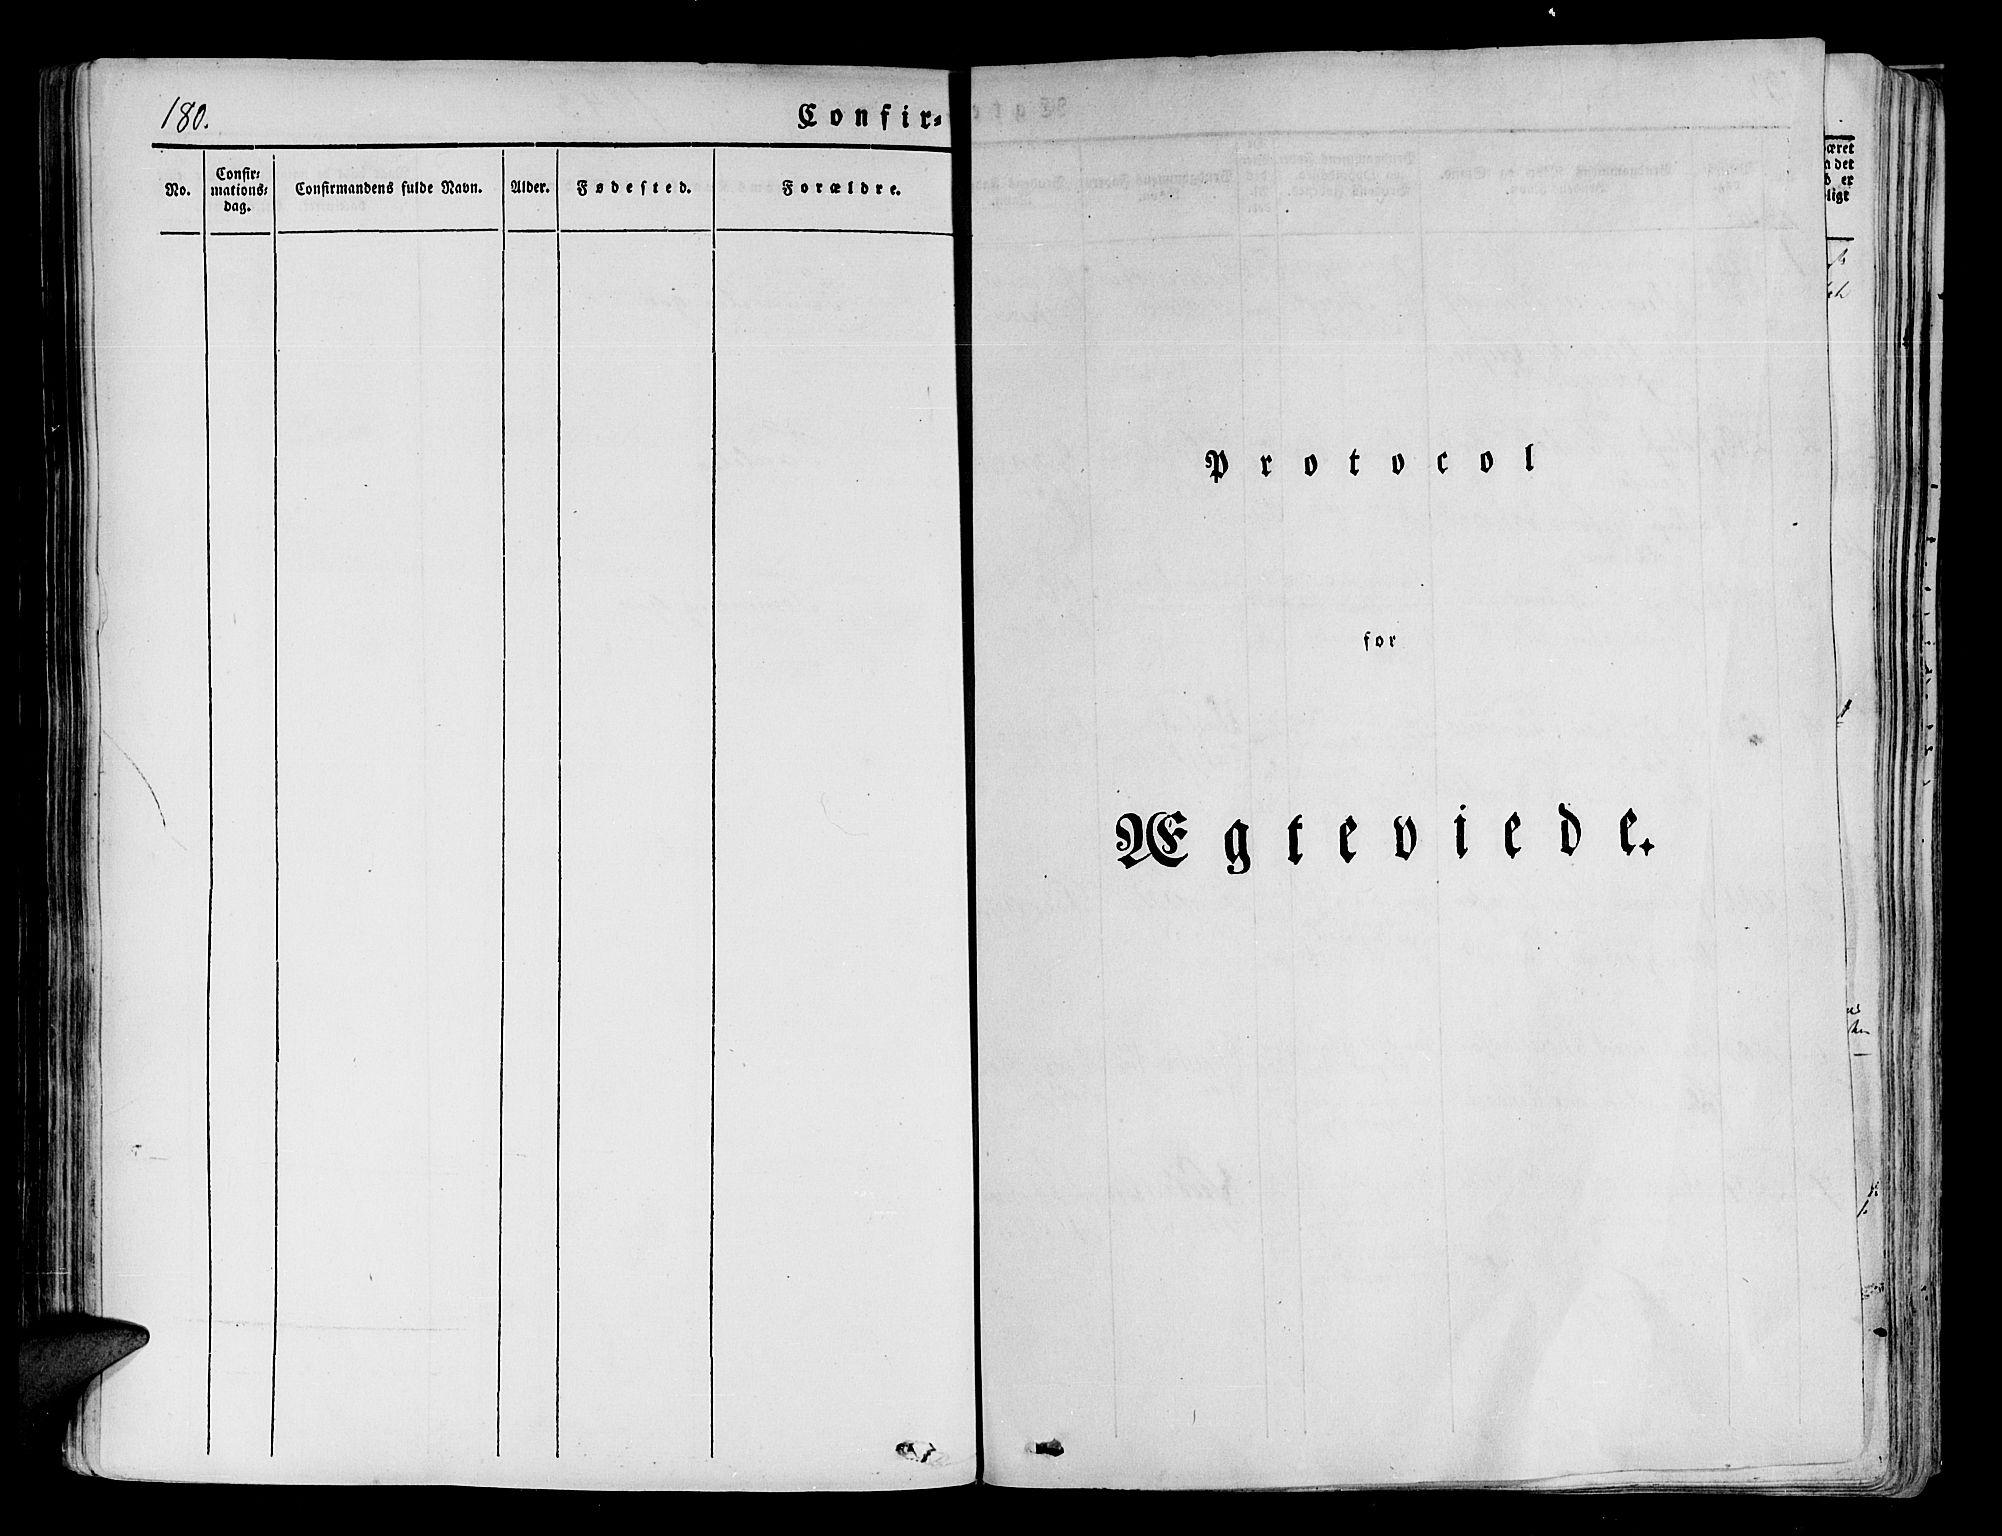 SATØ, Tranøy sokneprestkontor, I/Ia/Iaa/L0005kirke: Ministerialbok nr. 5, 1829-1844, s. 192